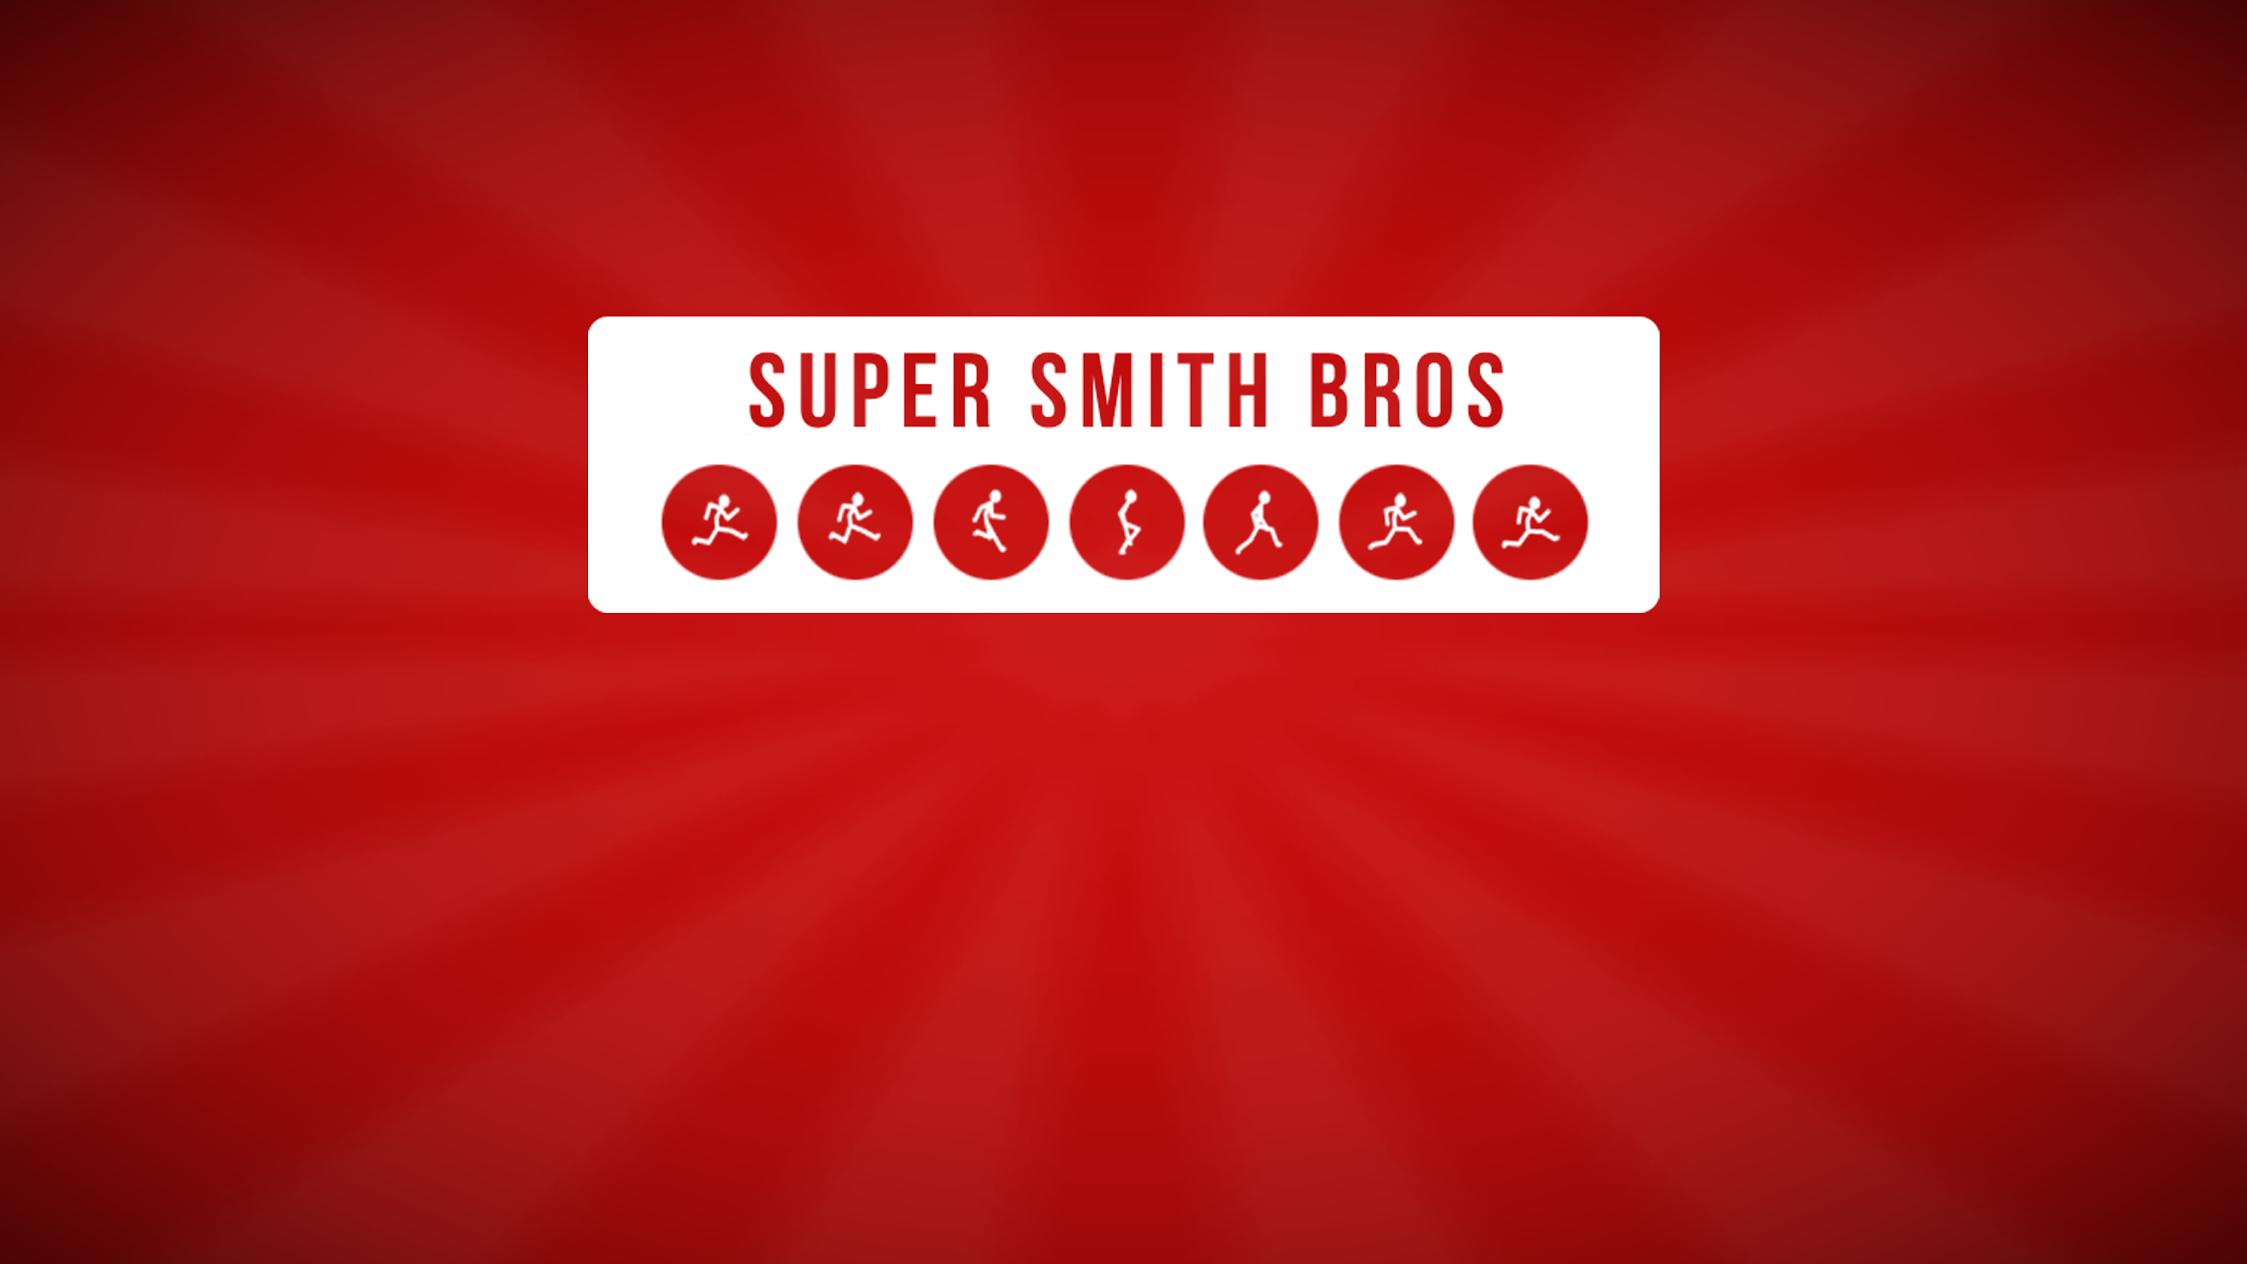 Super Smith Bros LTD